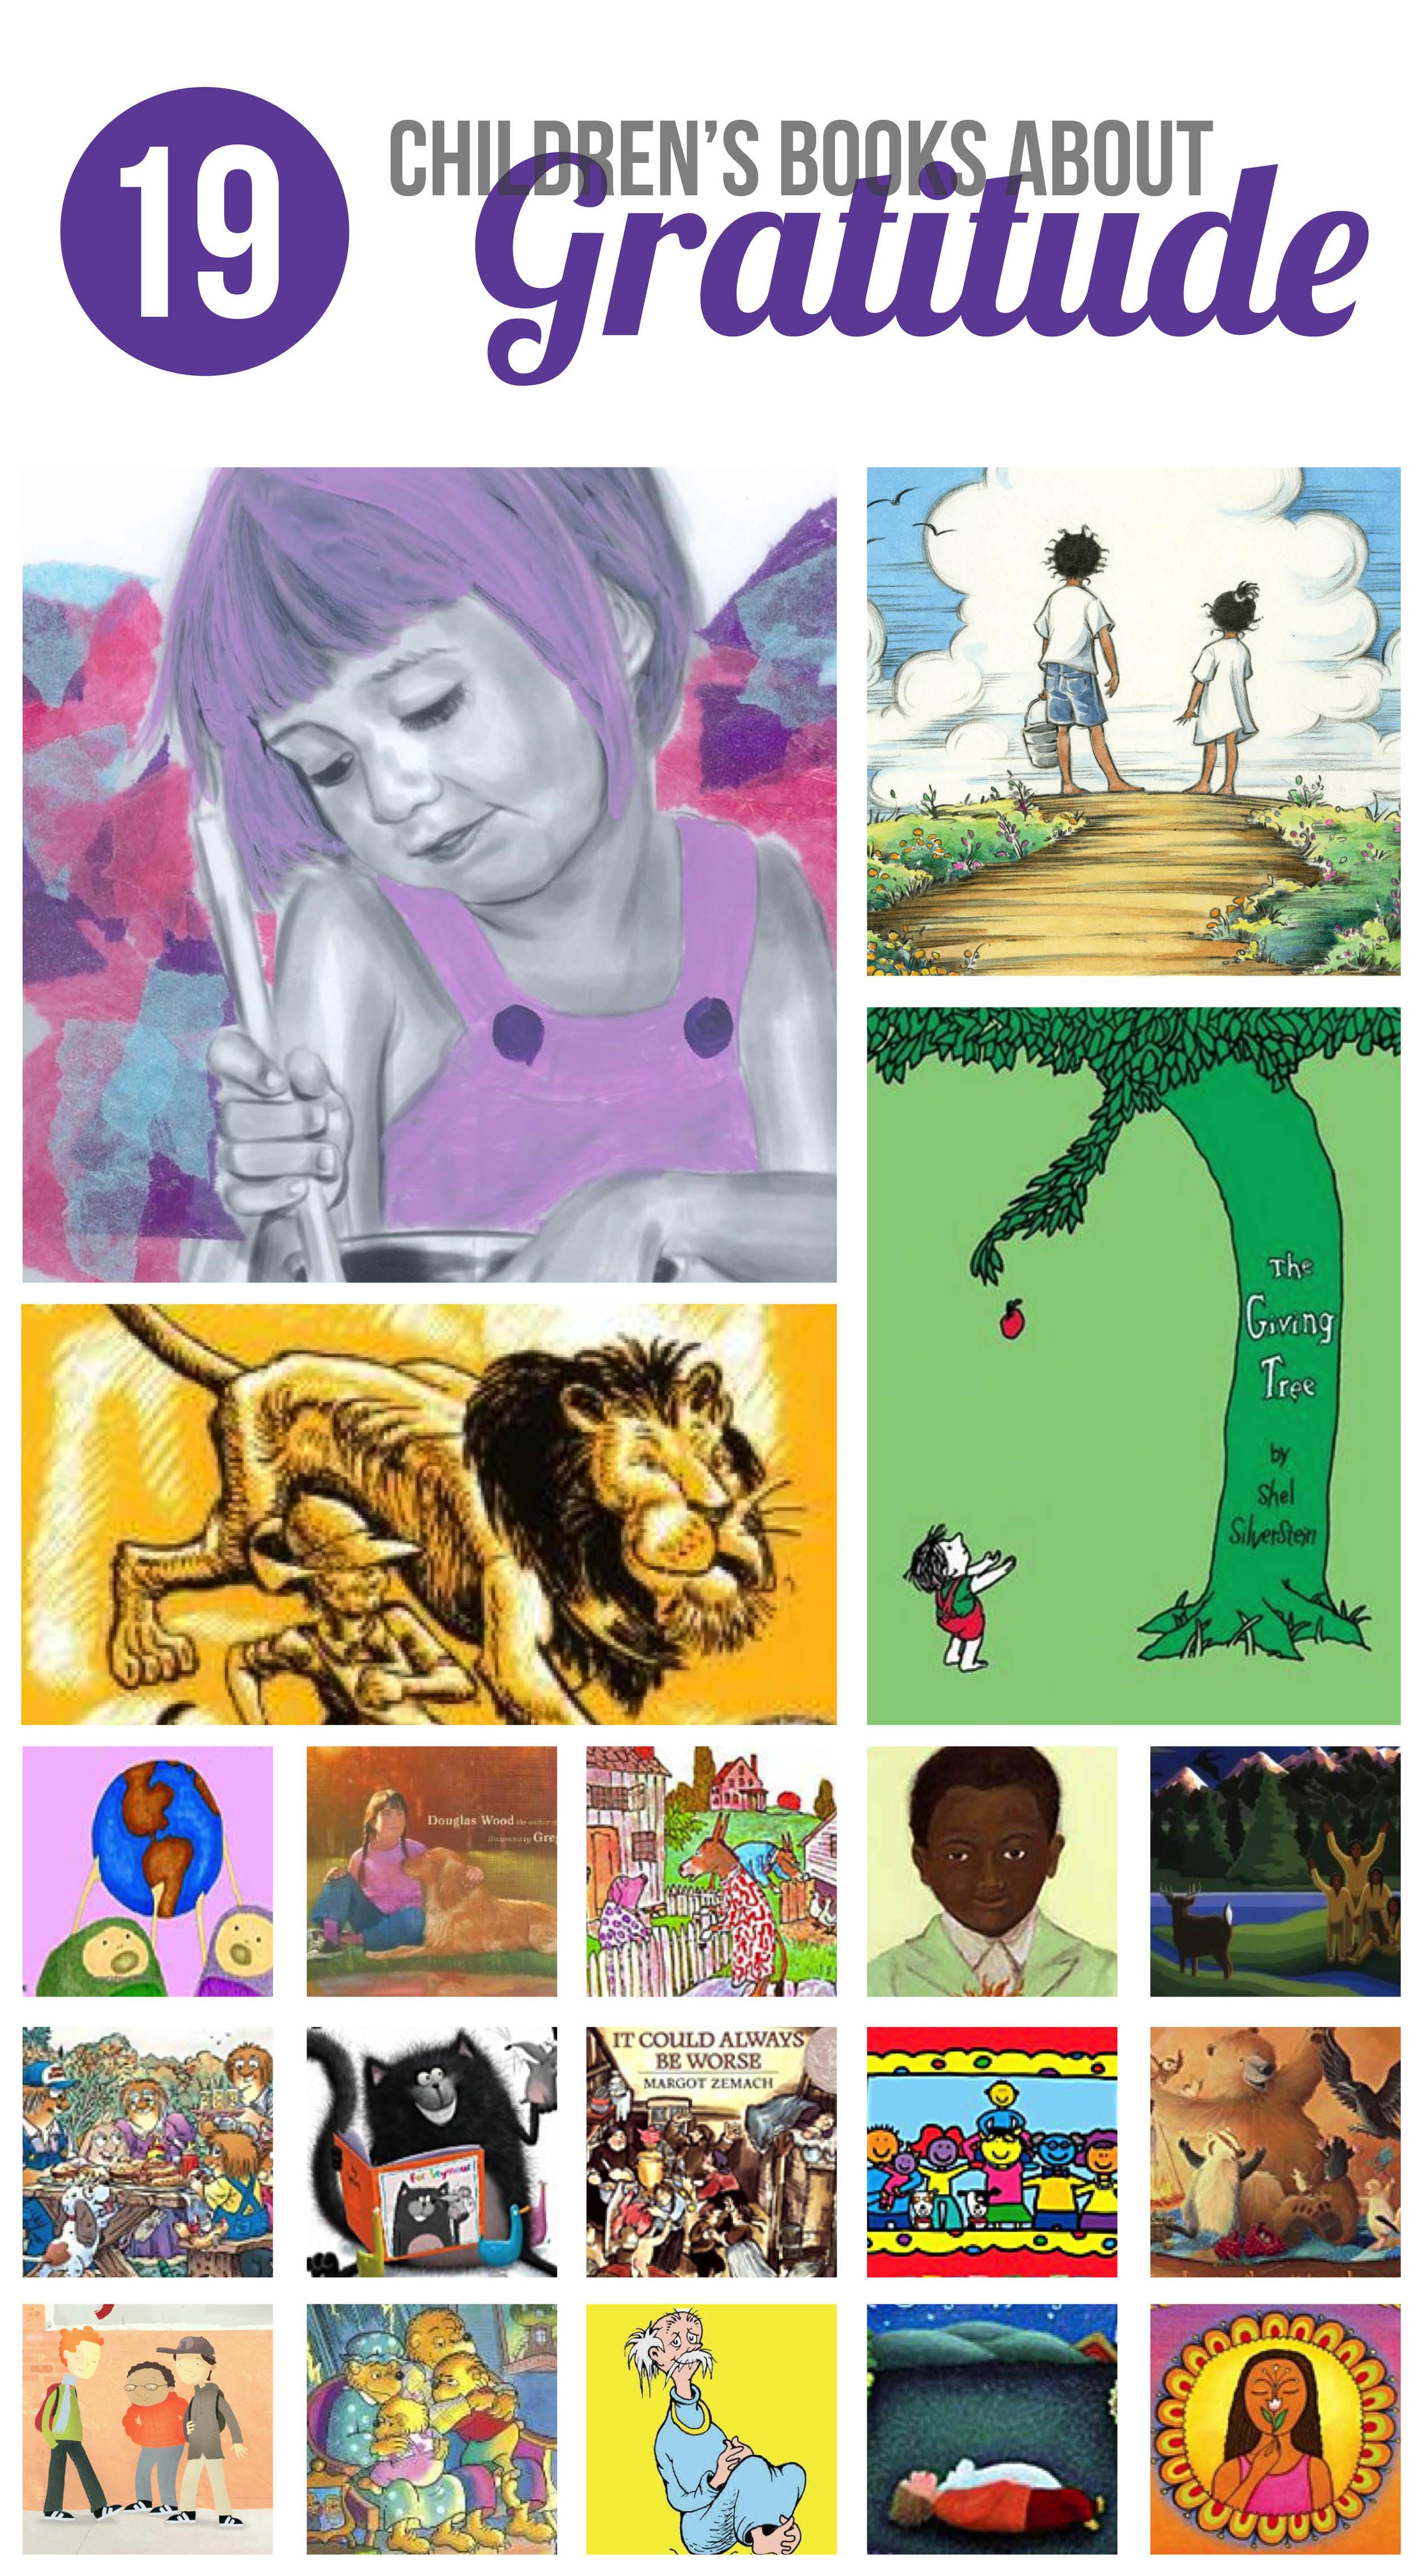 19 Children's Books About Gratitude.jpg